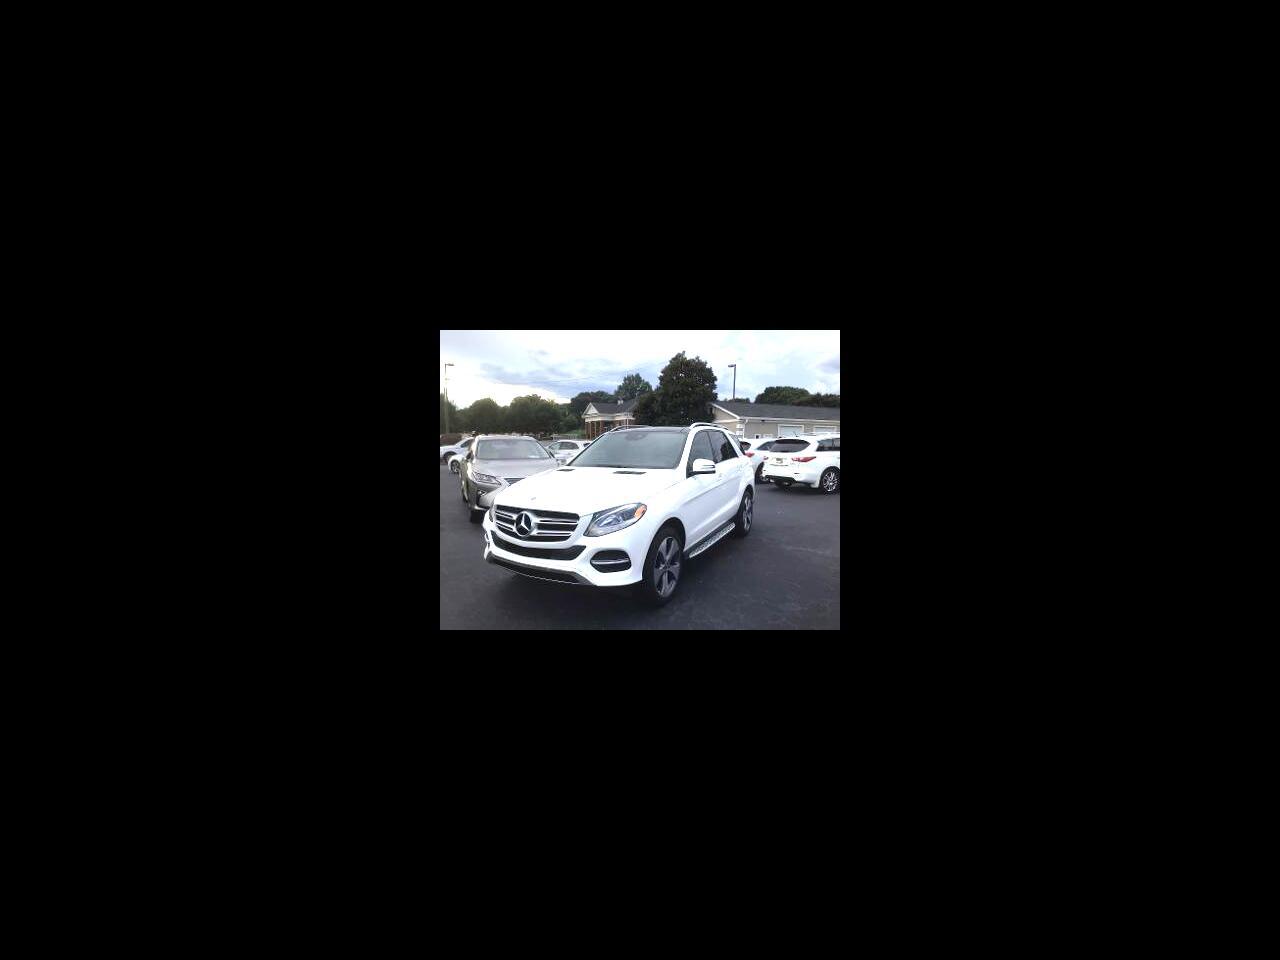 Mercedes-Benz GLE GLE 350 SUV 2018